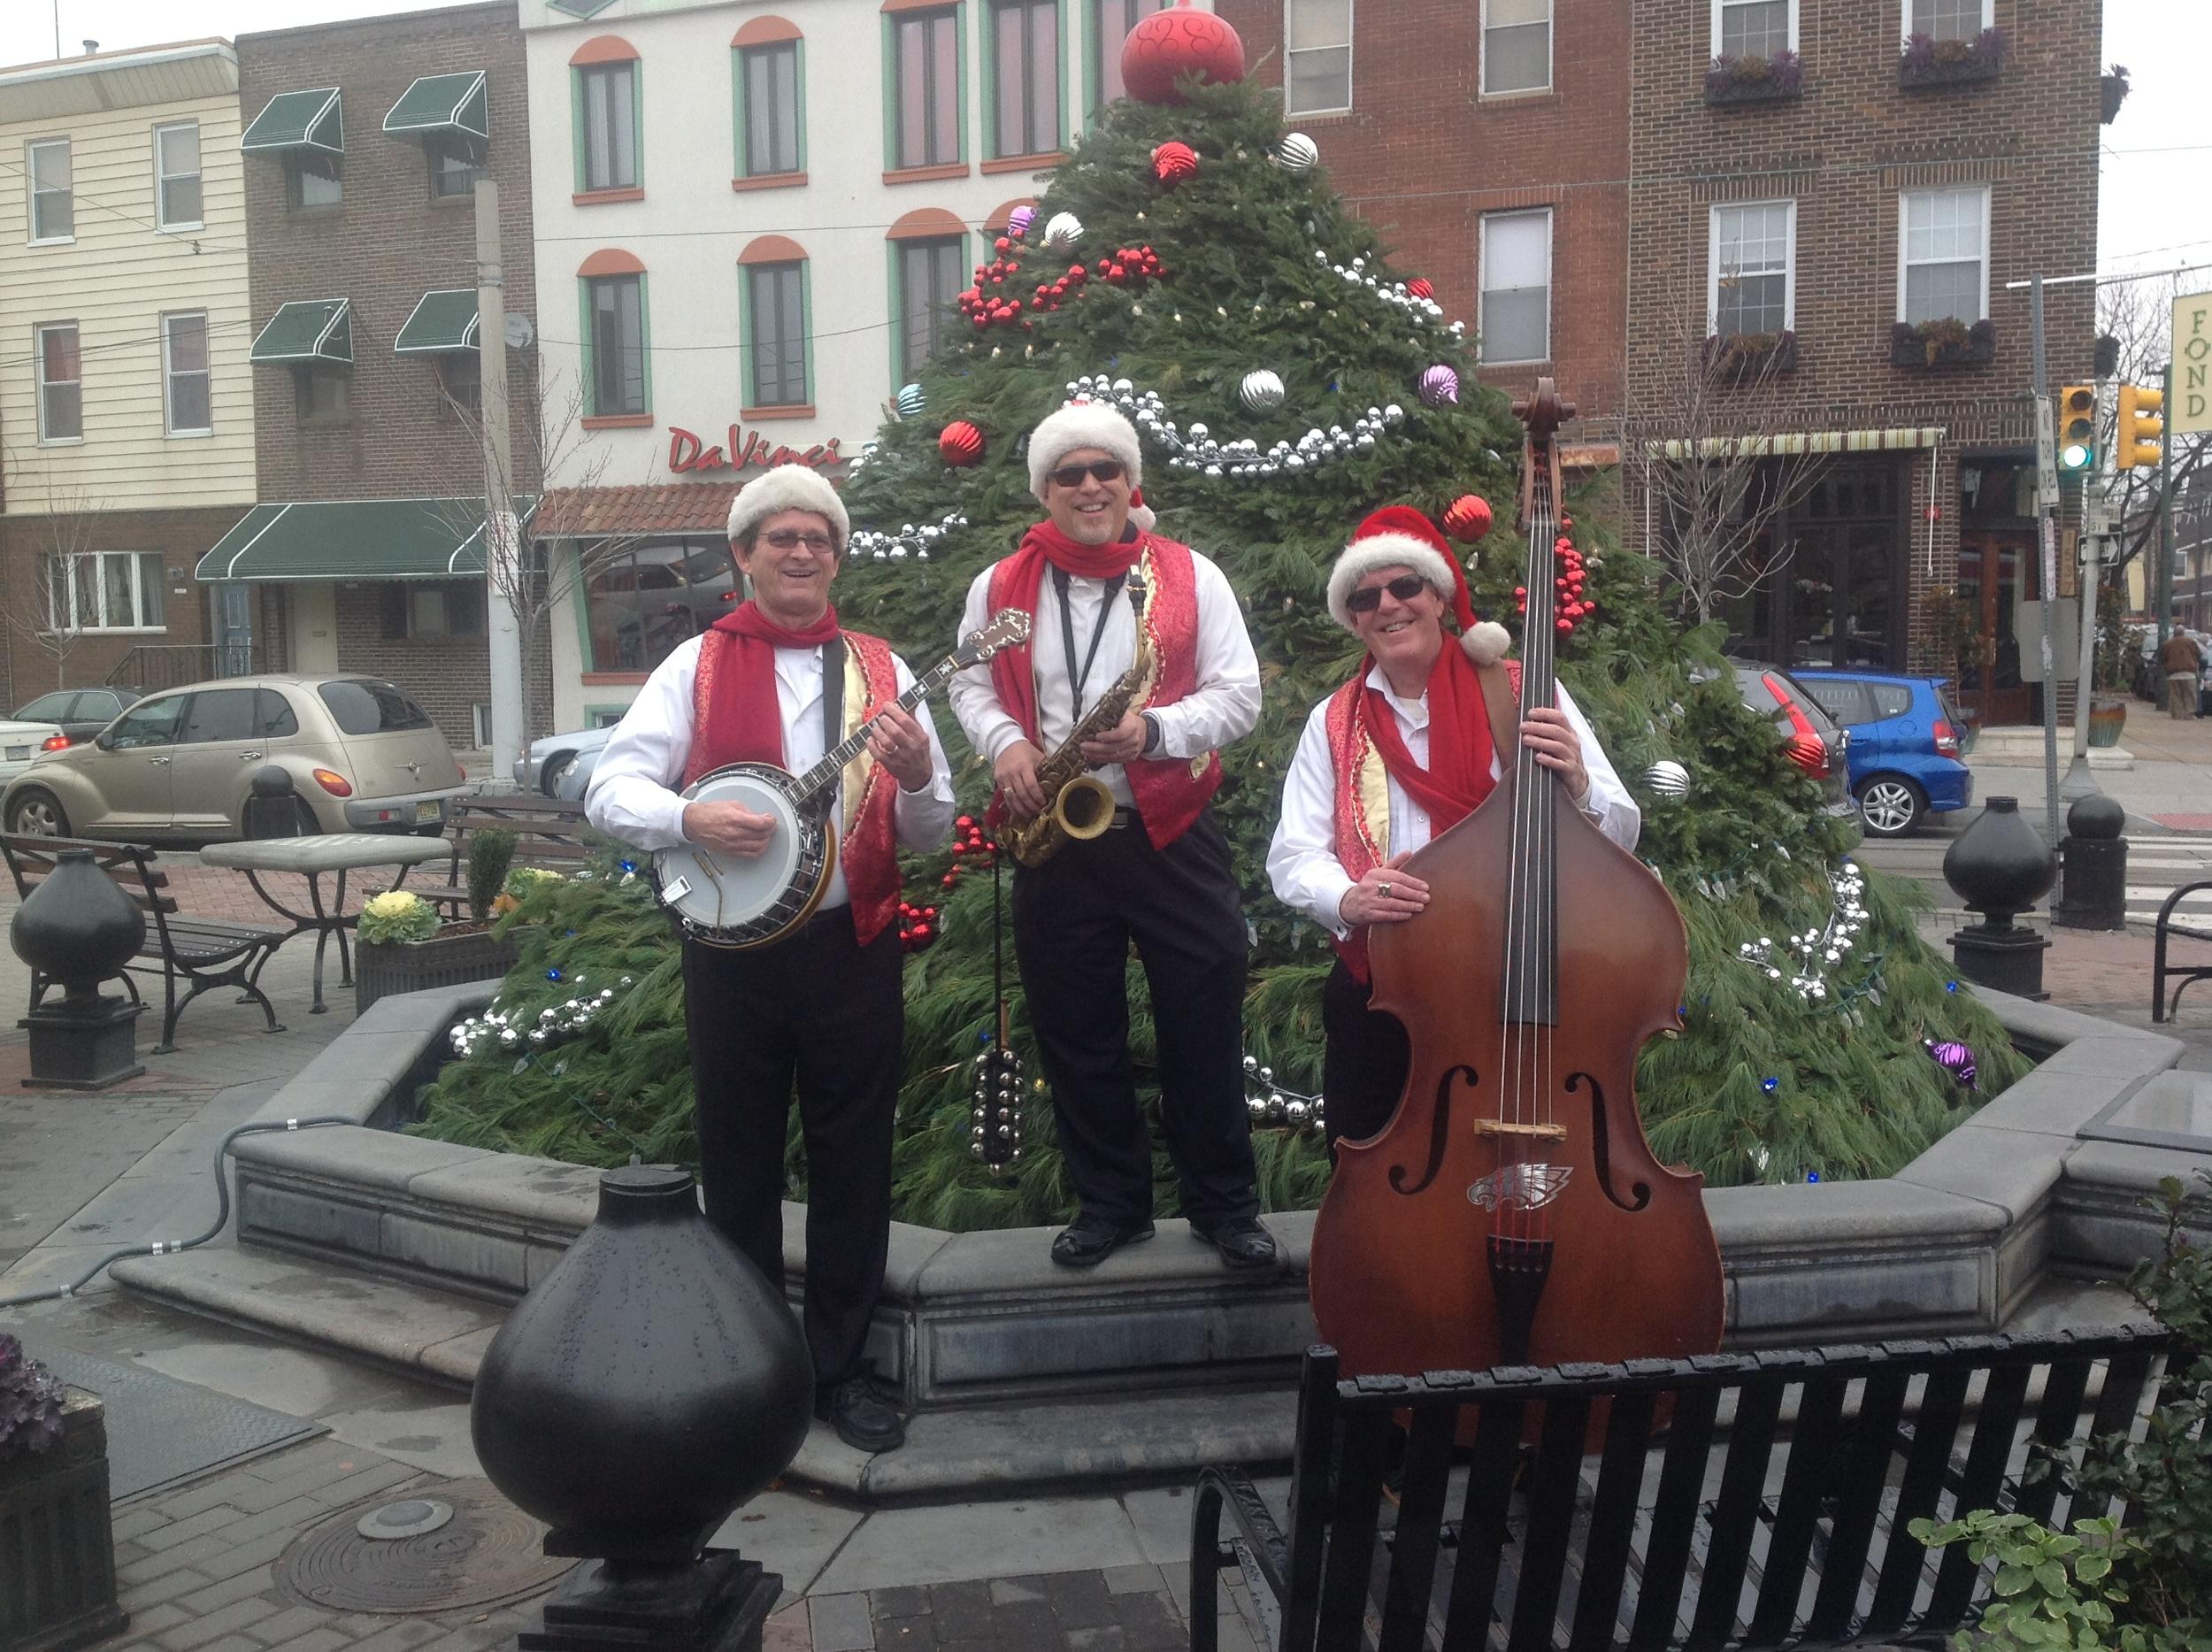 Joe King Trio, East Passyunk Avenue, Christmas Tree Light, Singing Fountain